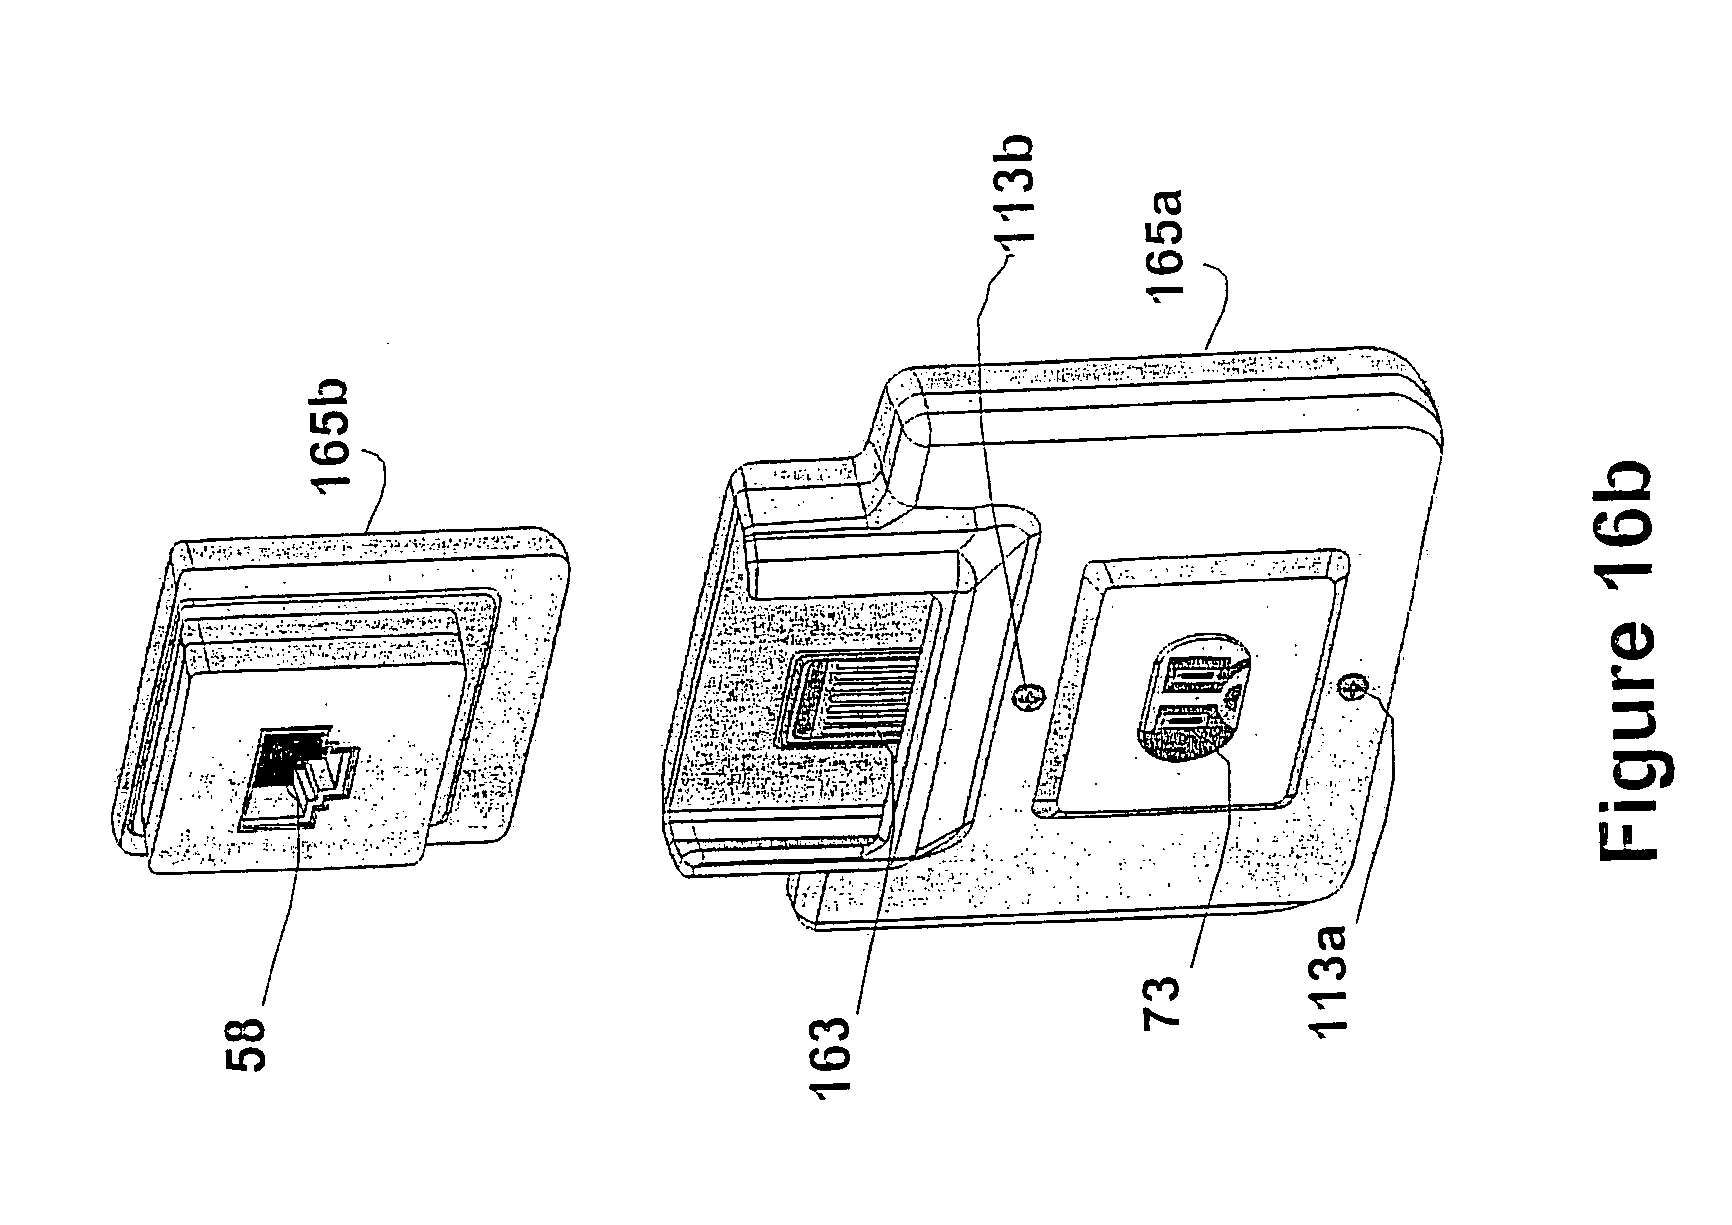 Weg Bc26624 Compressor Wiring Diagram,Bc • Creativeand.co